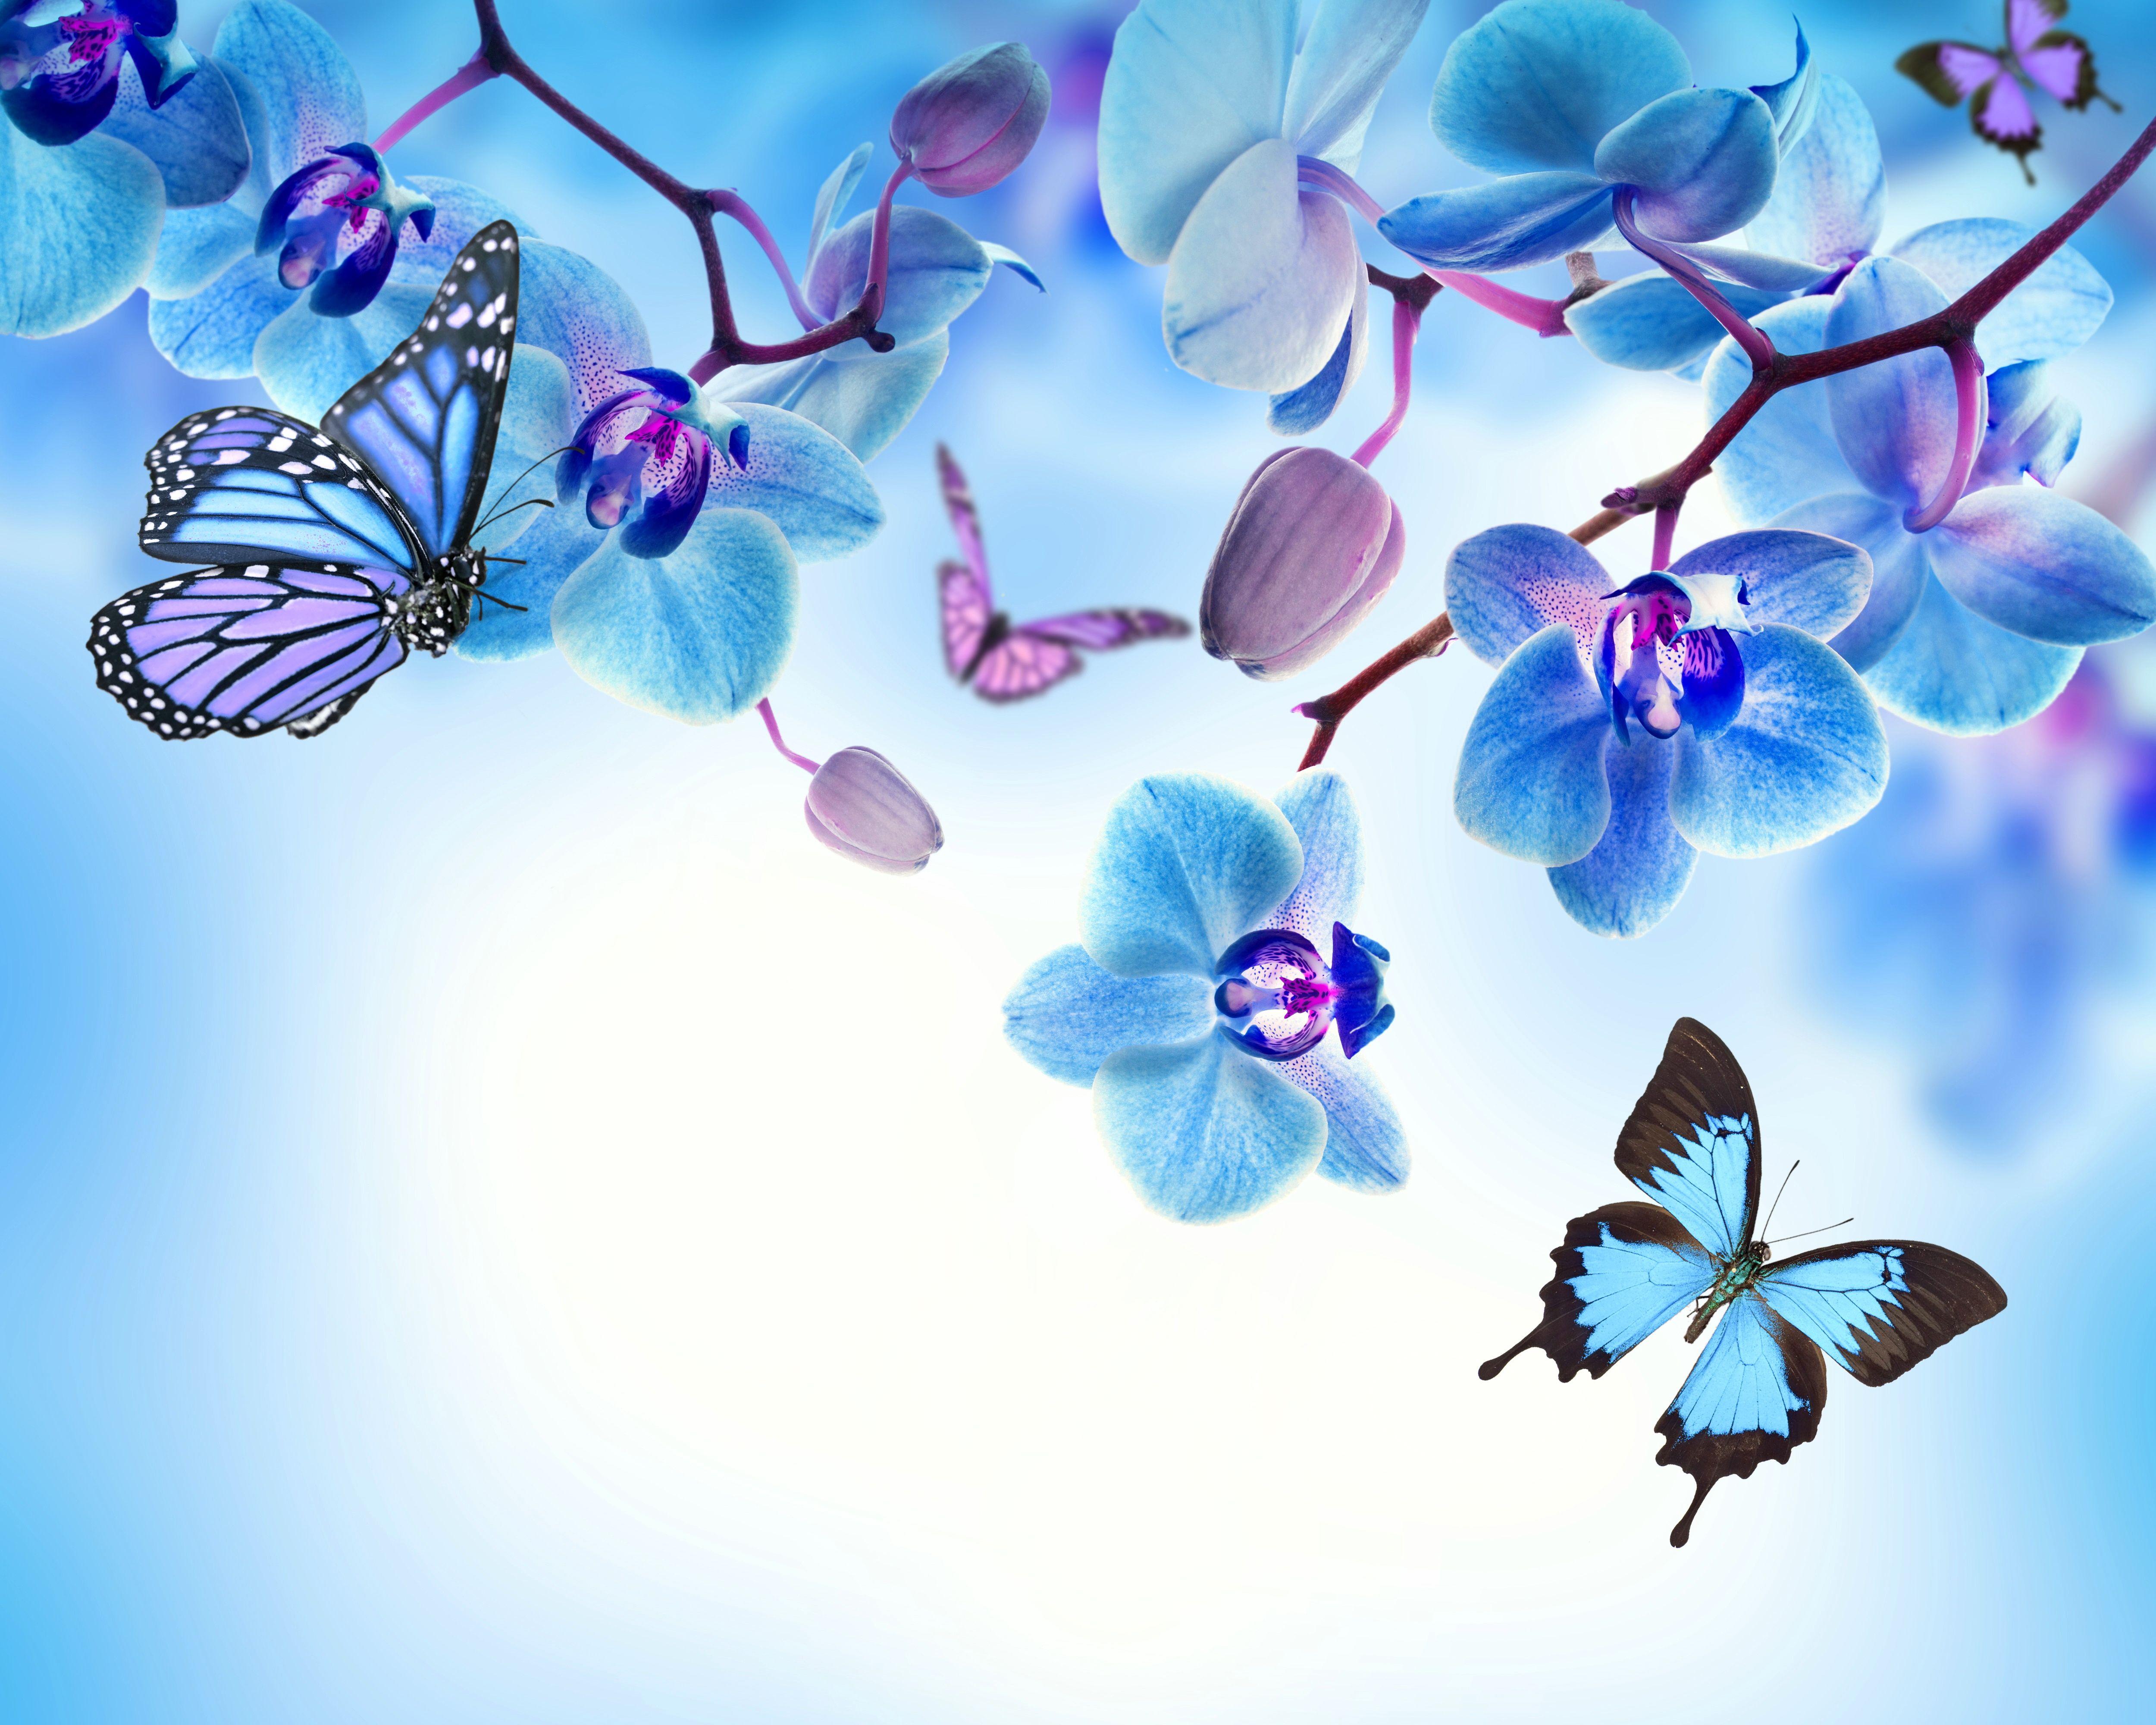 Download Wallpaper High Quality Purple - 63a15003e8f3dad3e6810cbbb77cc863  Gallery_602640.jpg